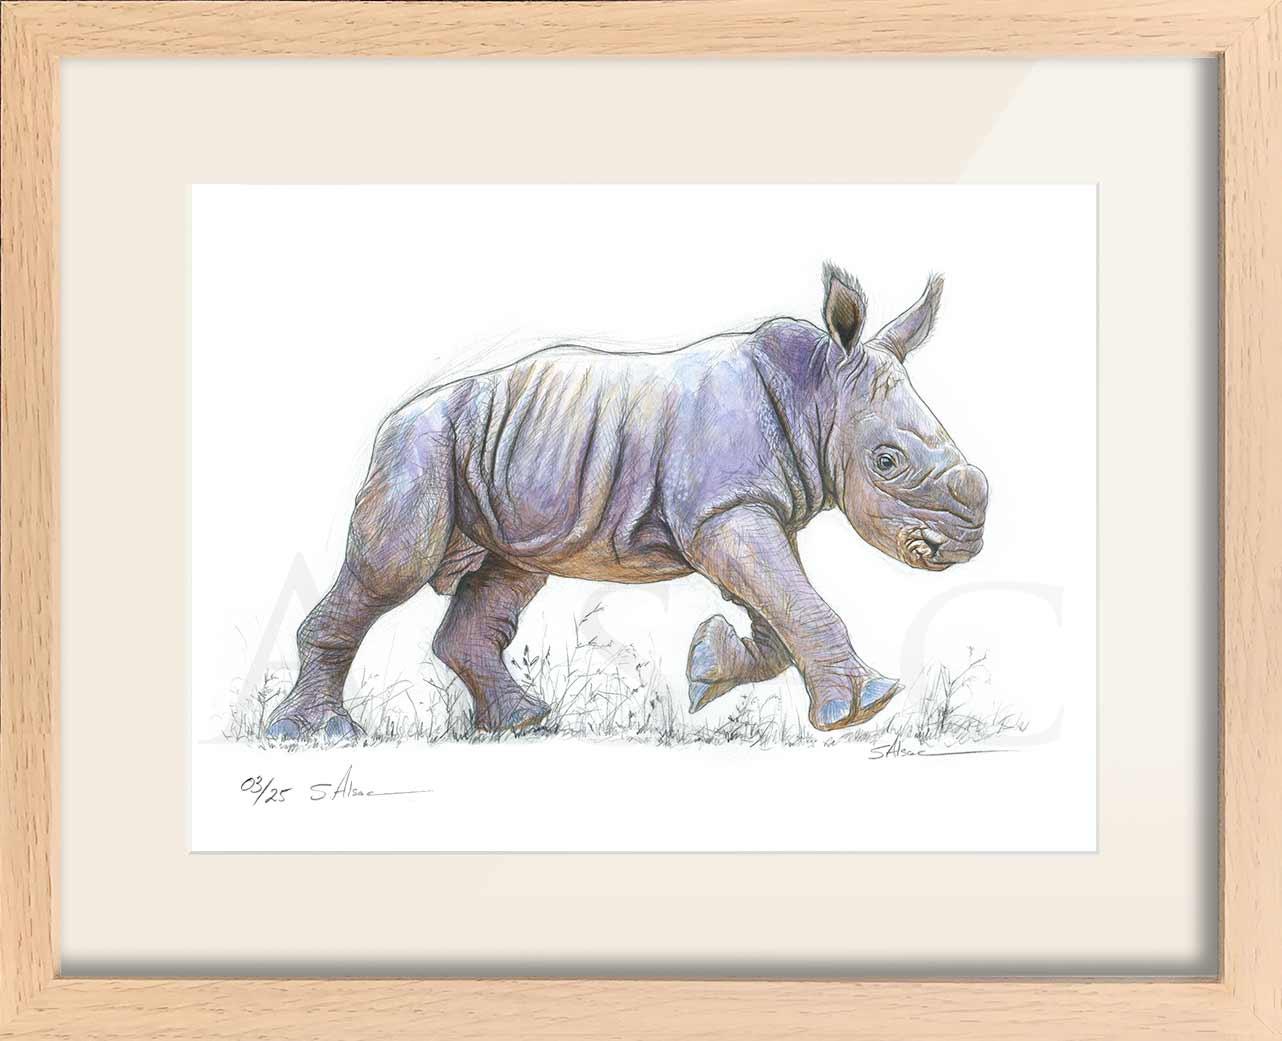 Tirage-Art-Reproduction-Dessin-Rhino-Bebe - Stéphane Alsac pour Image De Dessin A Reproduire